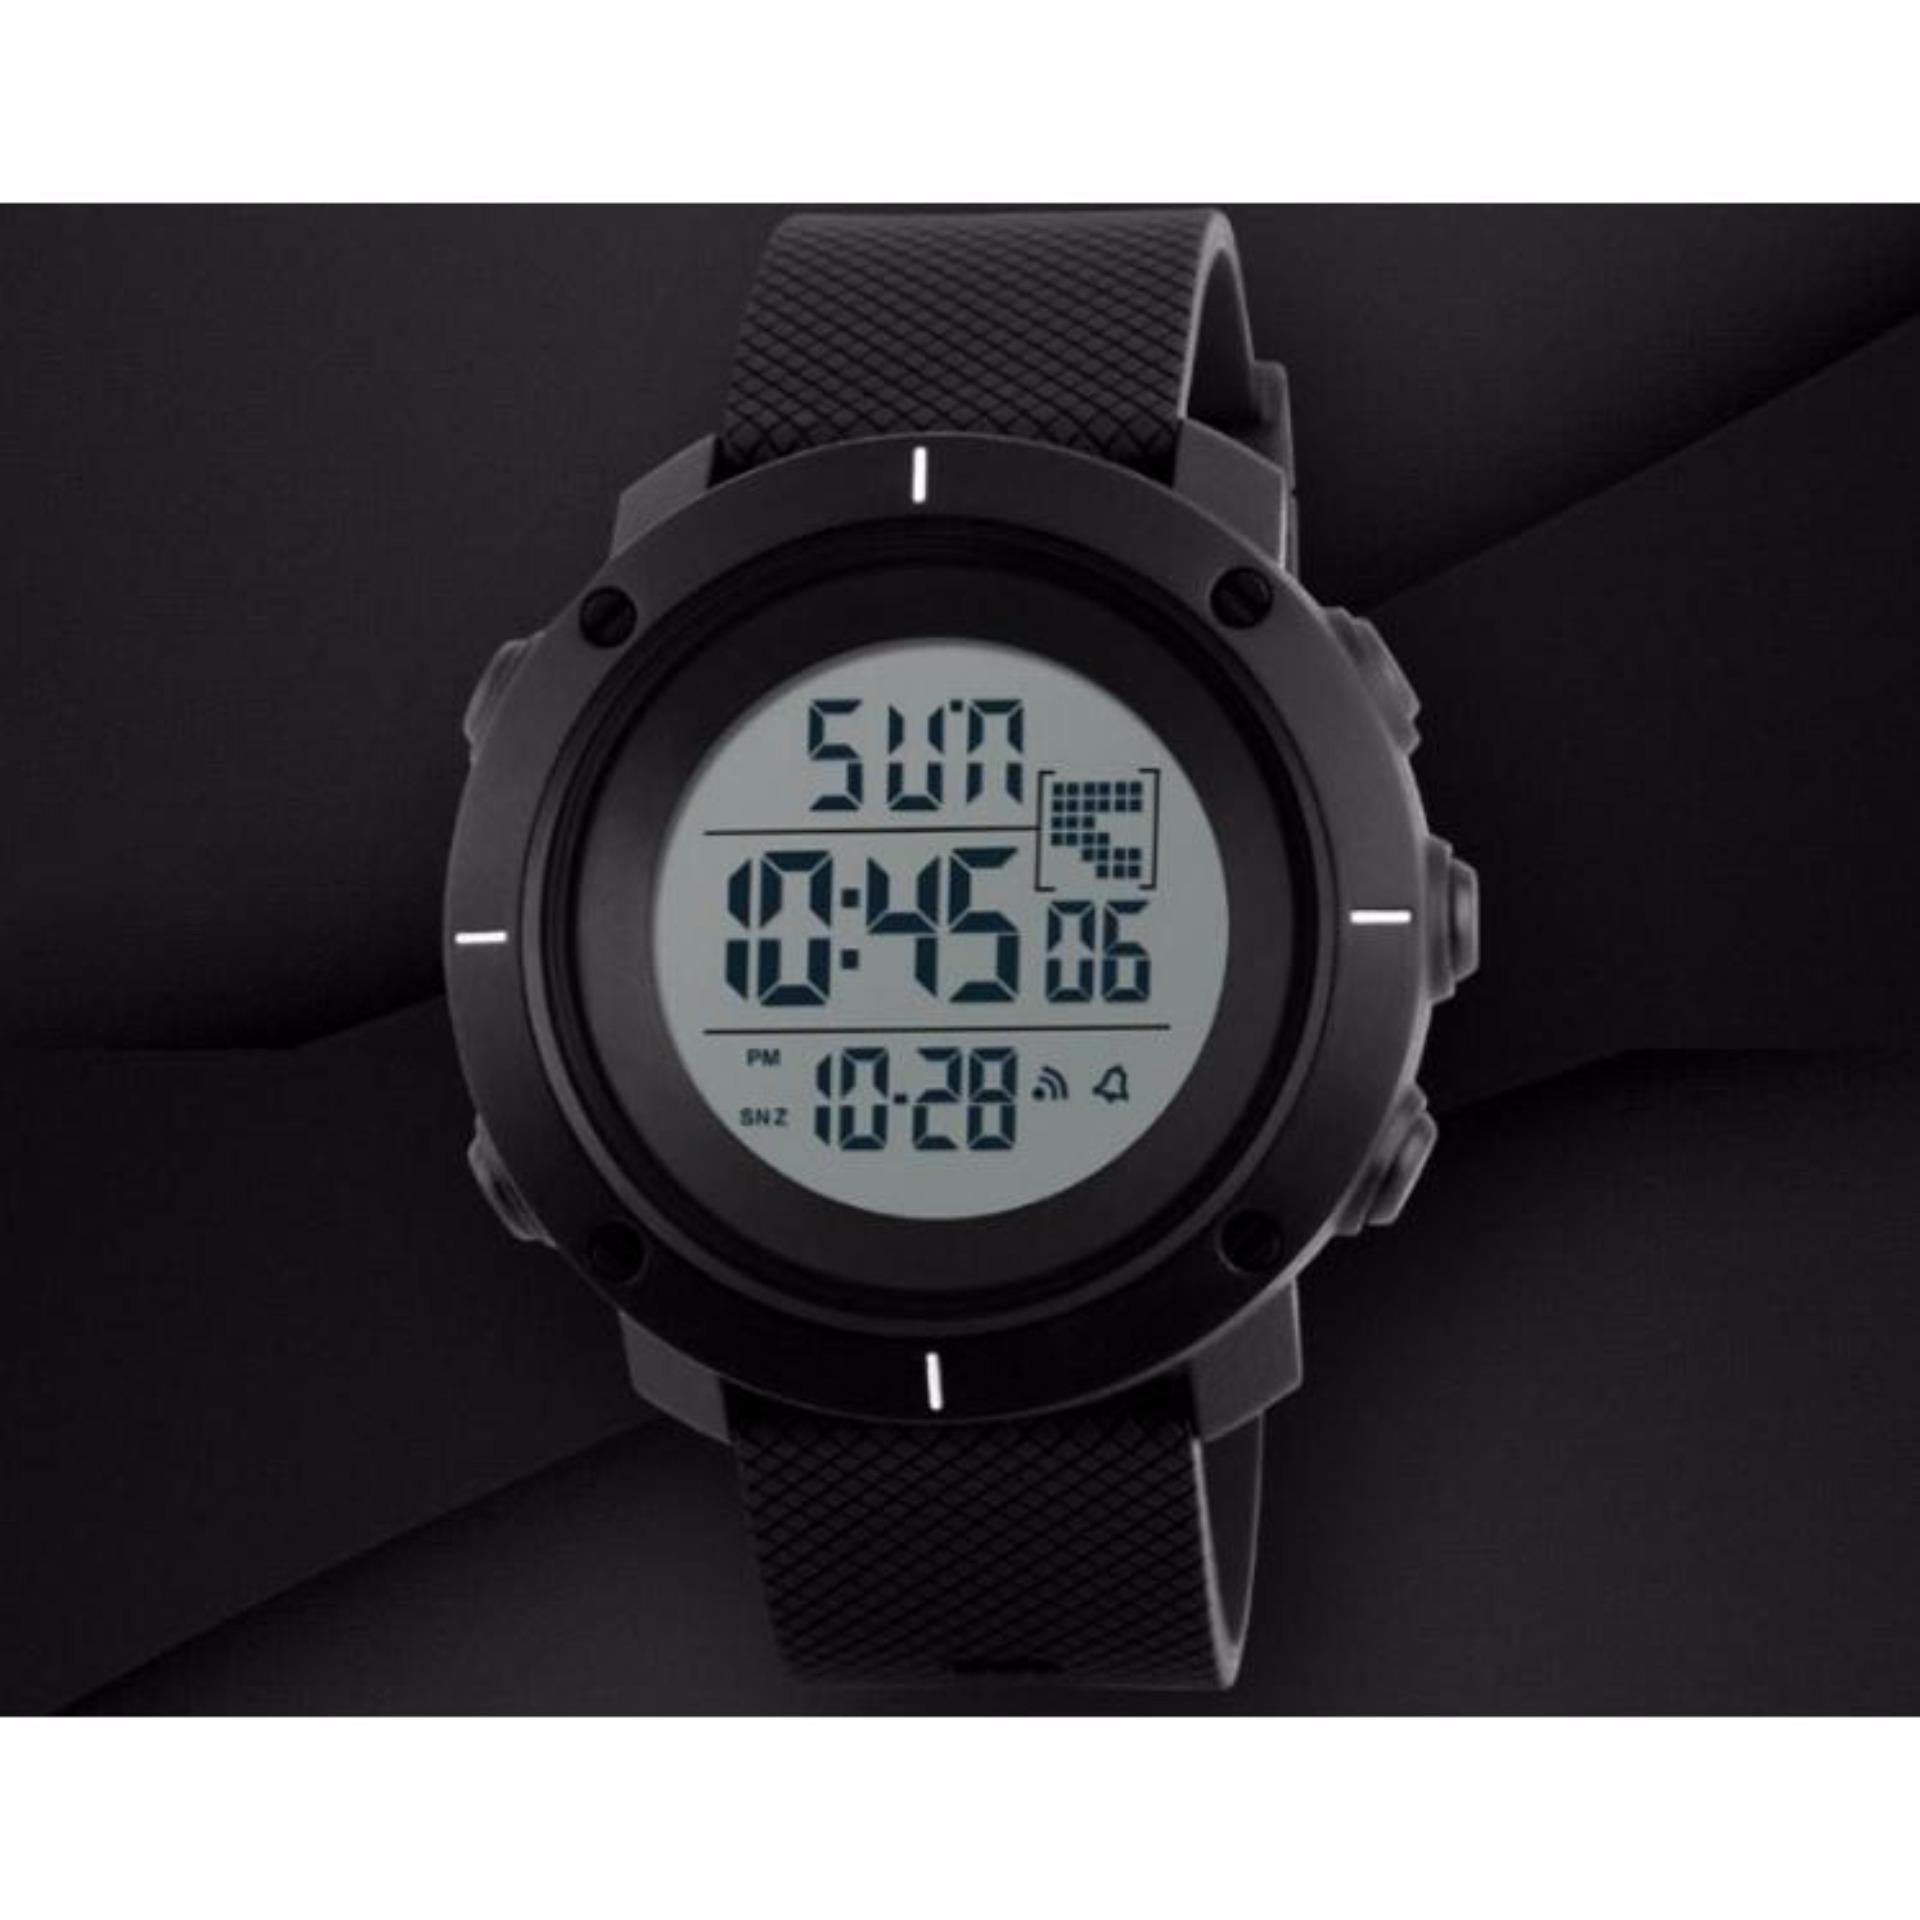 Periksa Peringkat Skmei Casual Men Silicone Strap Watch Water Jam Tangan Pria Resistant 30m 1208 50m Dg1213 Silicon